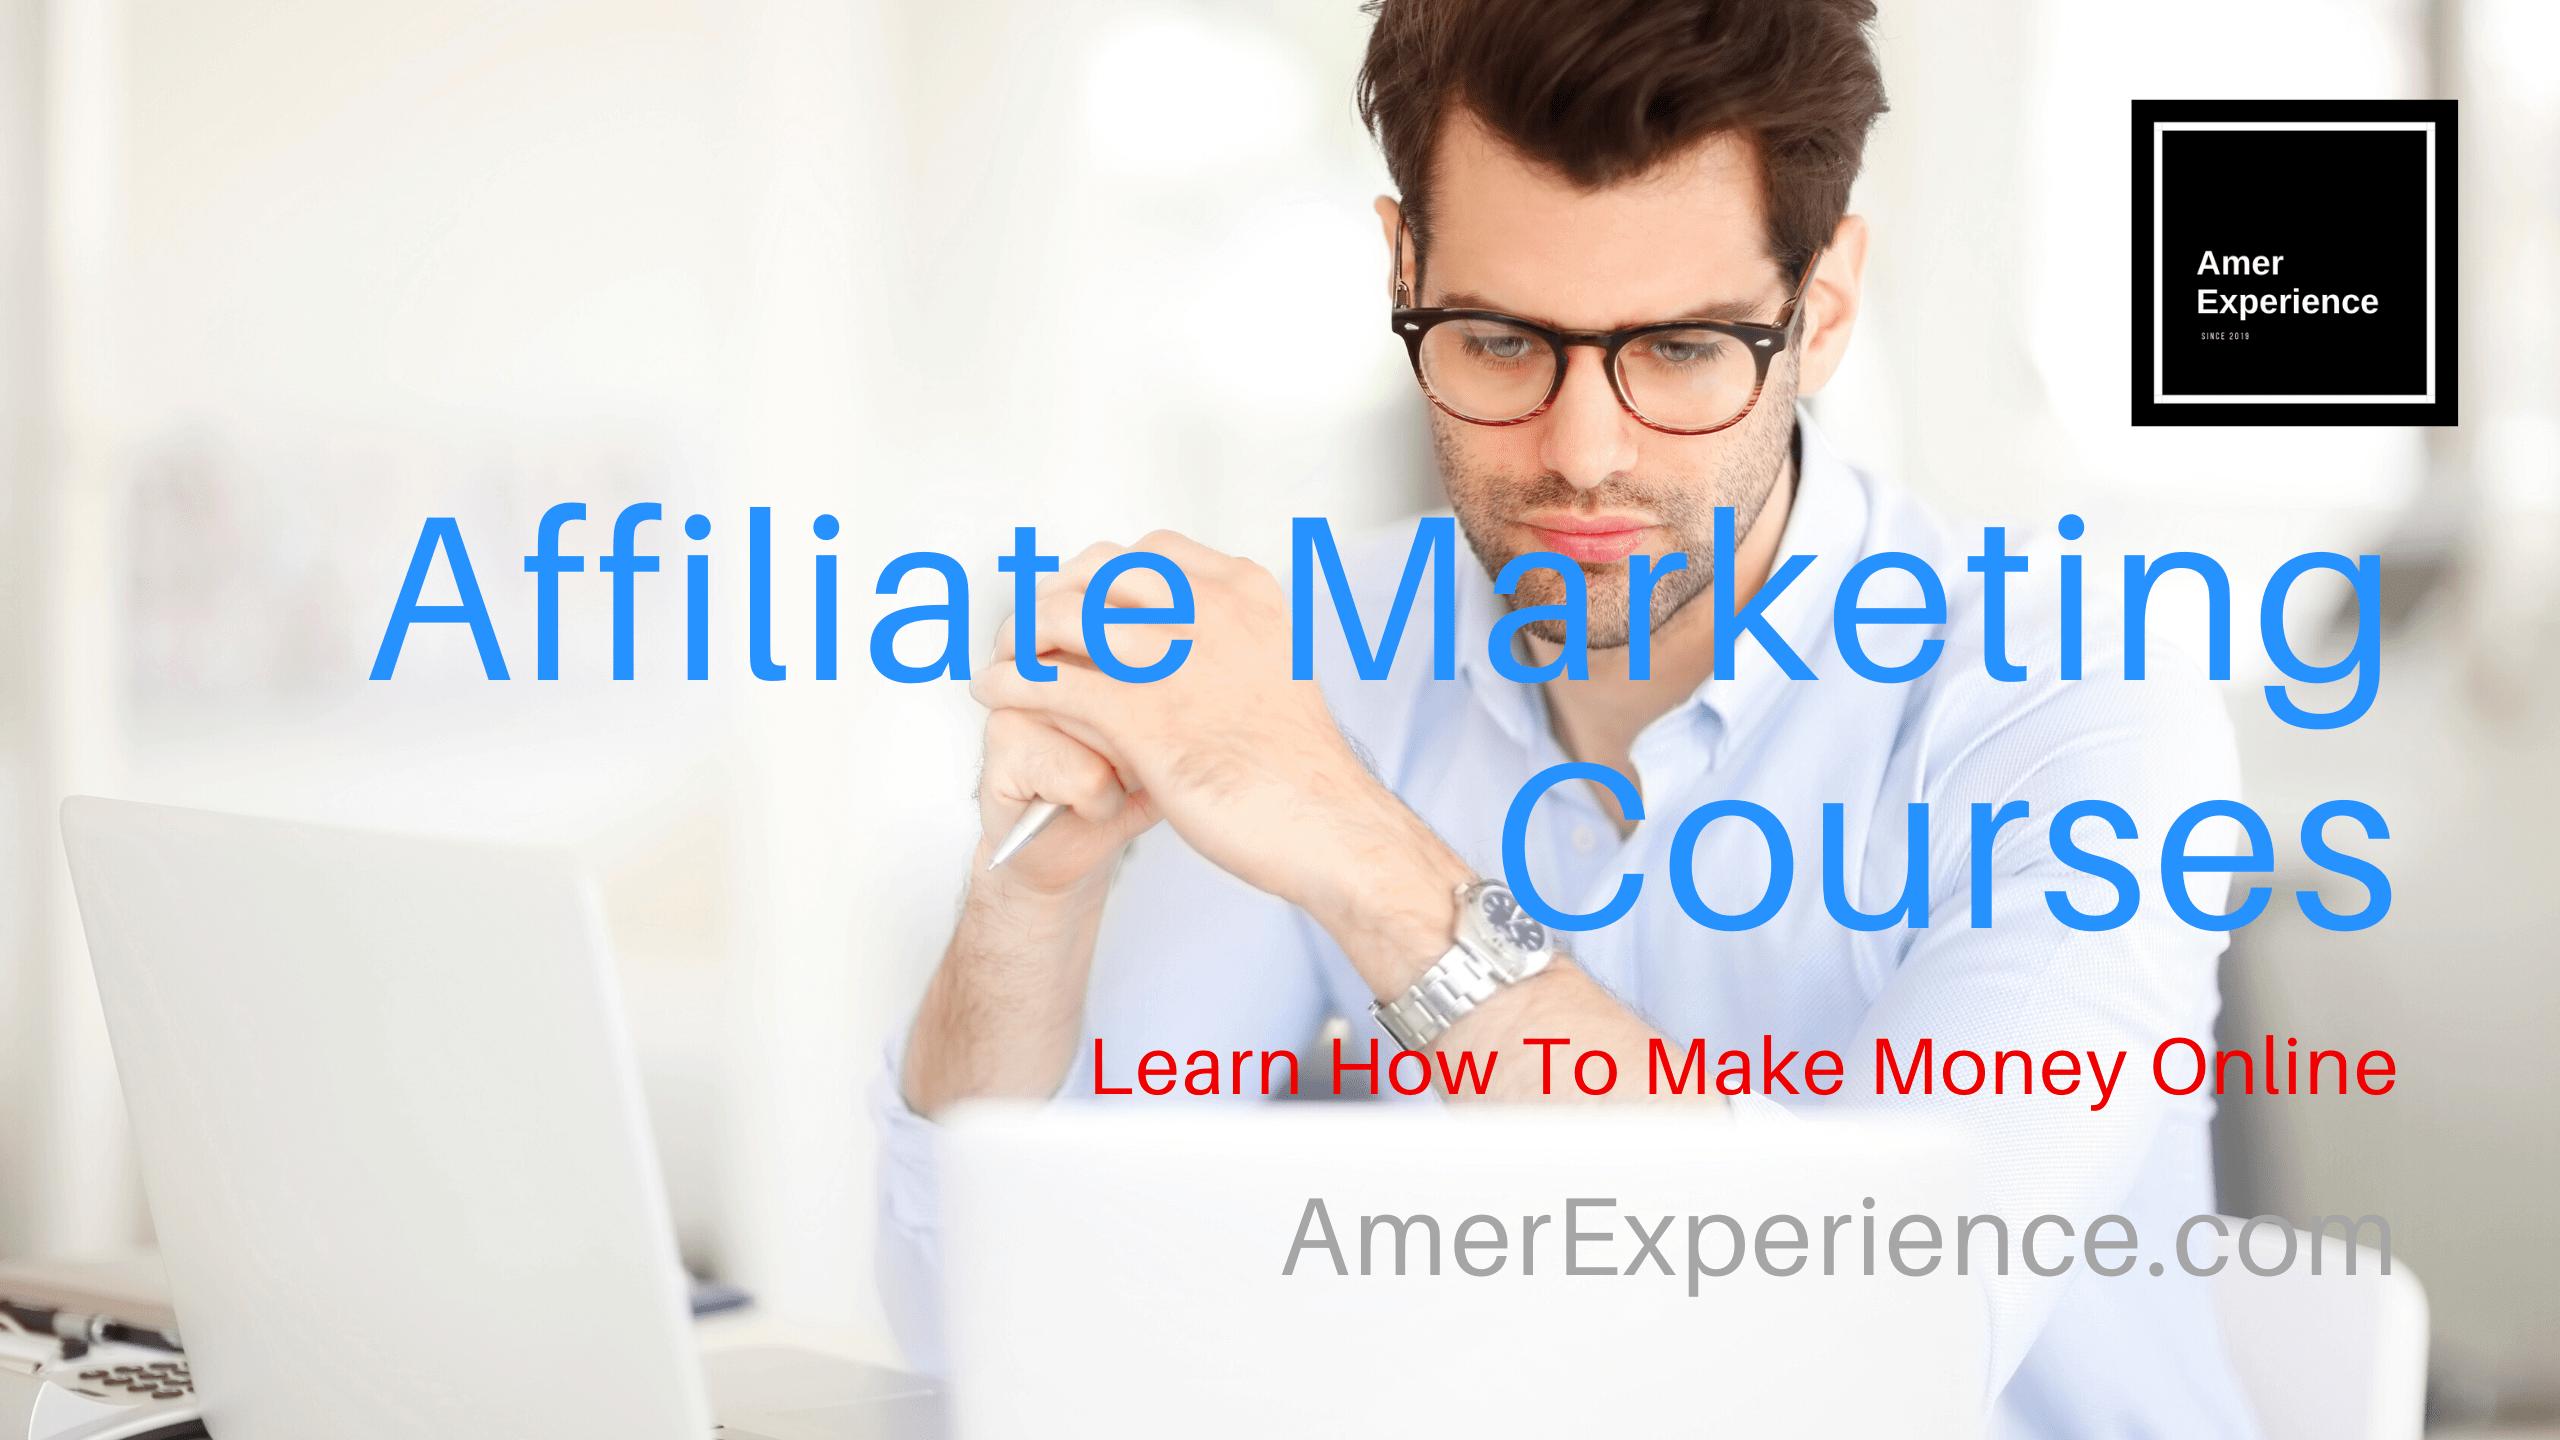 Affiliate Marketing Courses Clickbank - Make Money Online